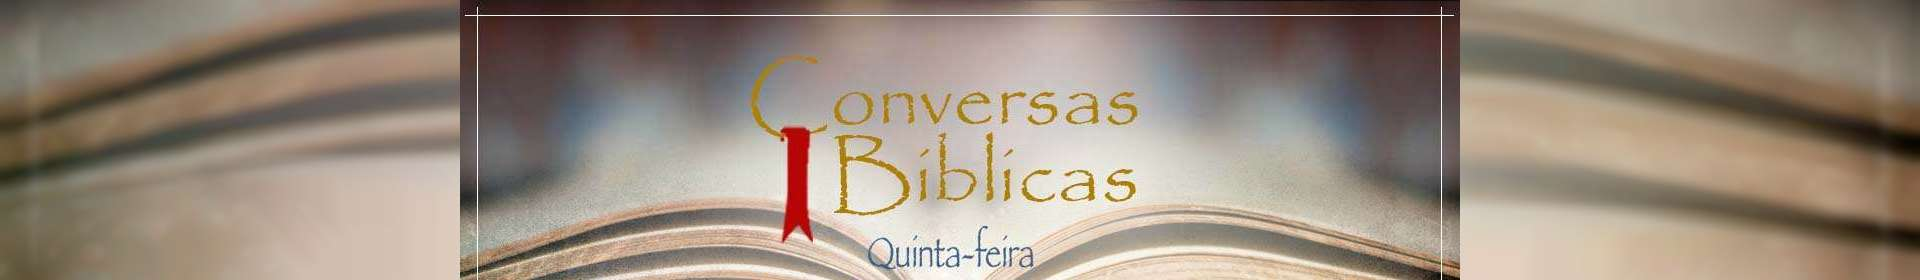 Conversas Bíblicas: Doutrina de Corpo - Parte 1